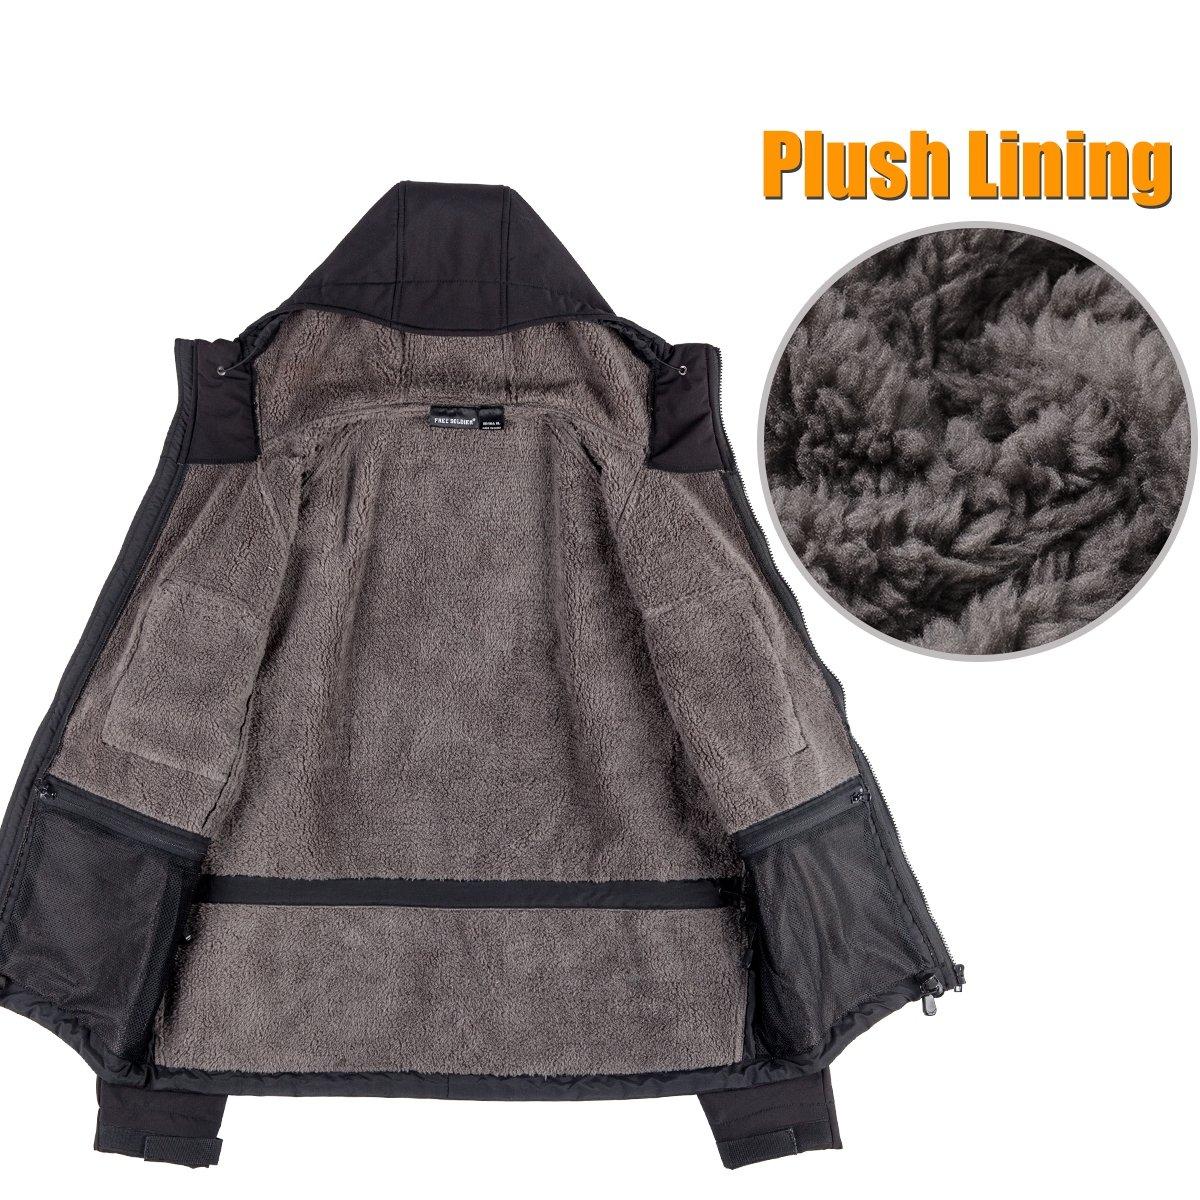 FREE SOLDIER Mens Jacket Multi-Function Softshell Tactical Jacket Plush Lined Warm Coats Hooded Jacket